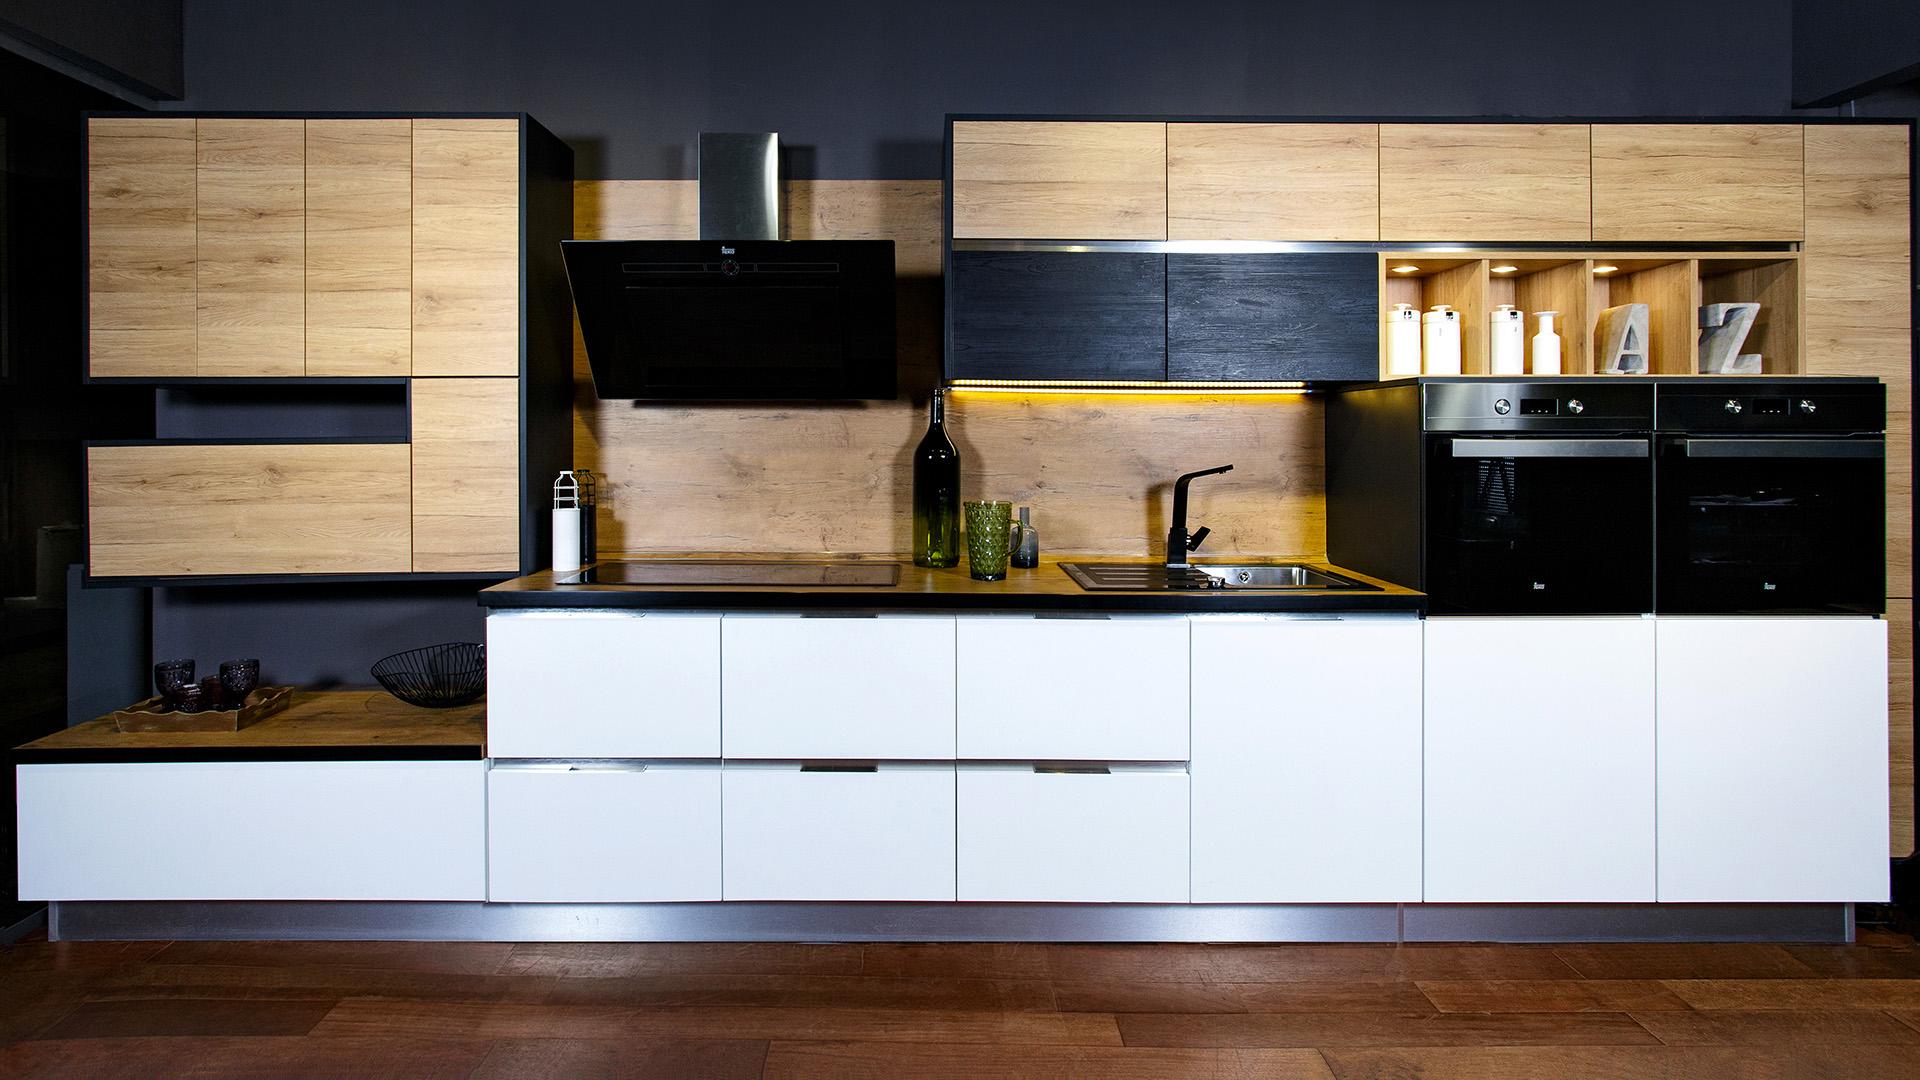 Съемка кухонной мебели MEBEL Milano